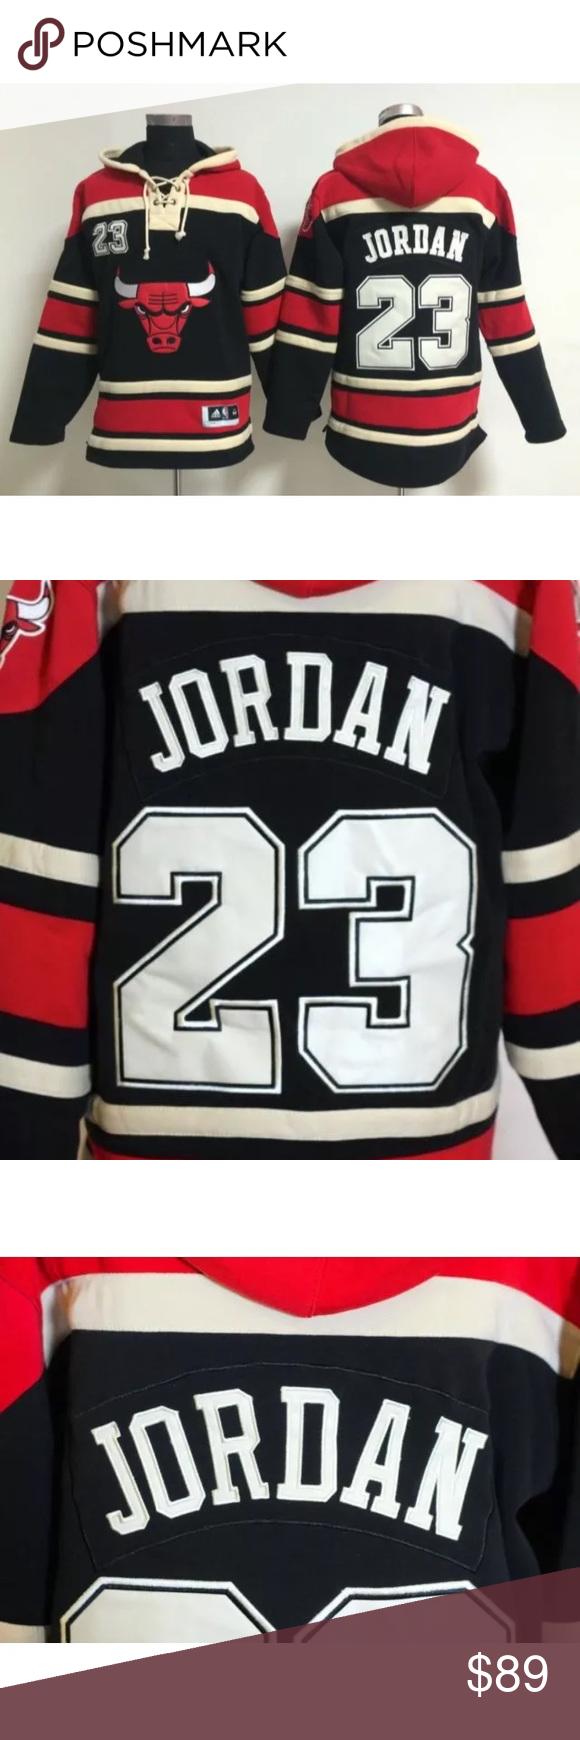 68972a8d Jordan Bulls Limited edition Hockey style Hoodie LIMITED EDITION NWOT  Michael Jordan Chicago Bulls Hockey style laced Hoodie. Fleece interior  lining.